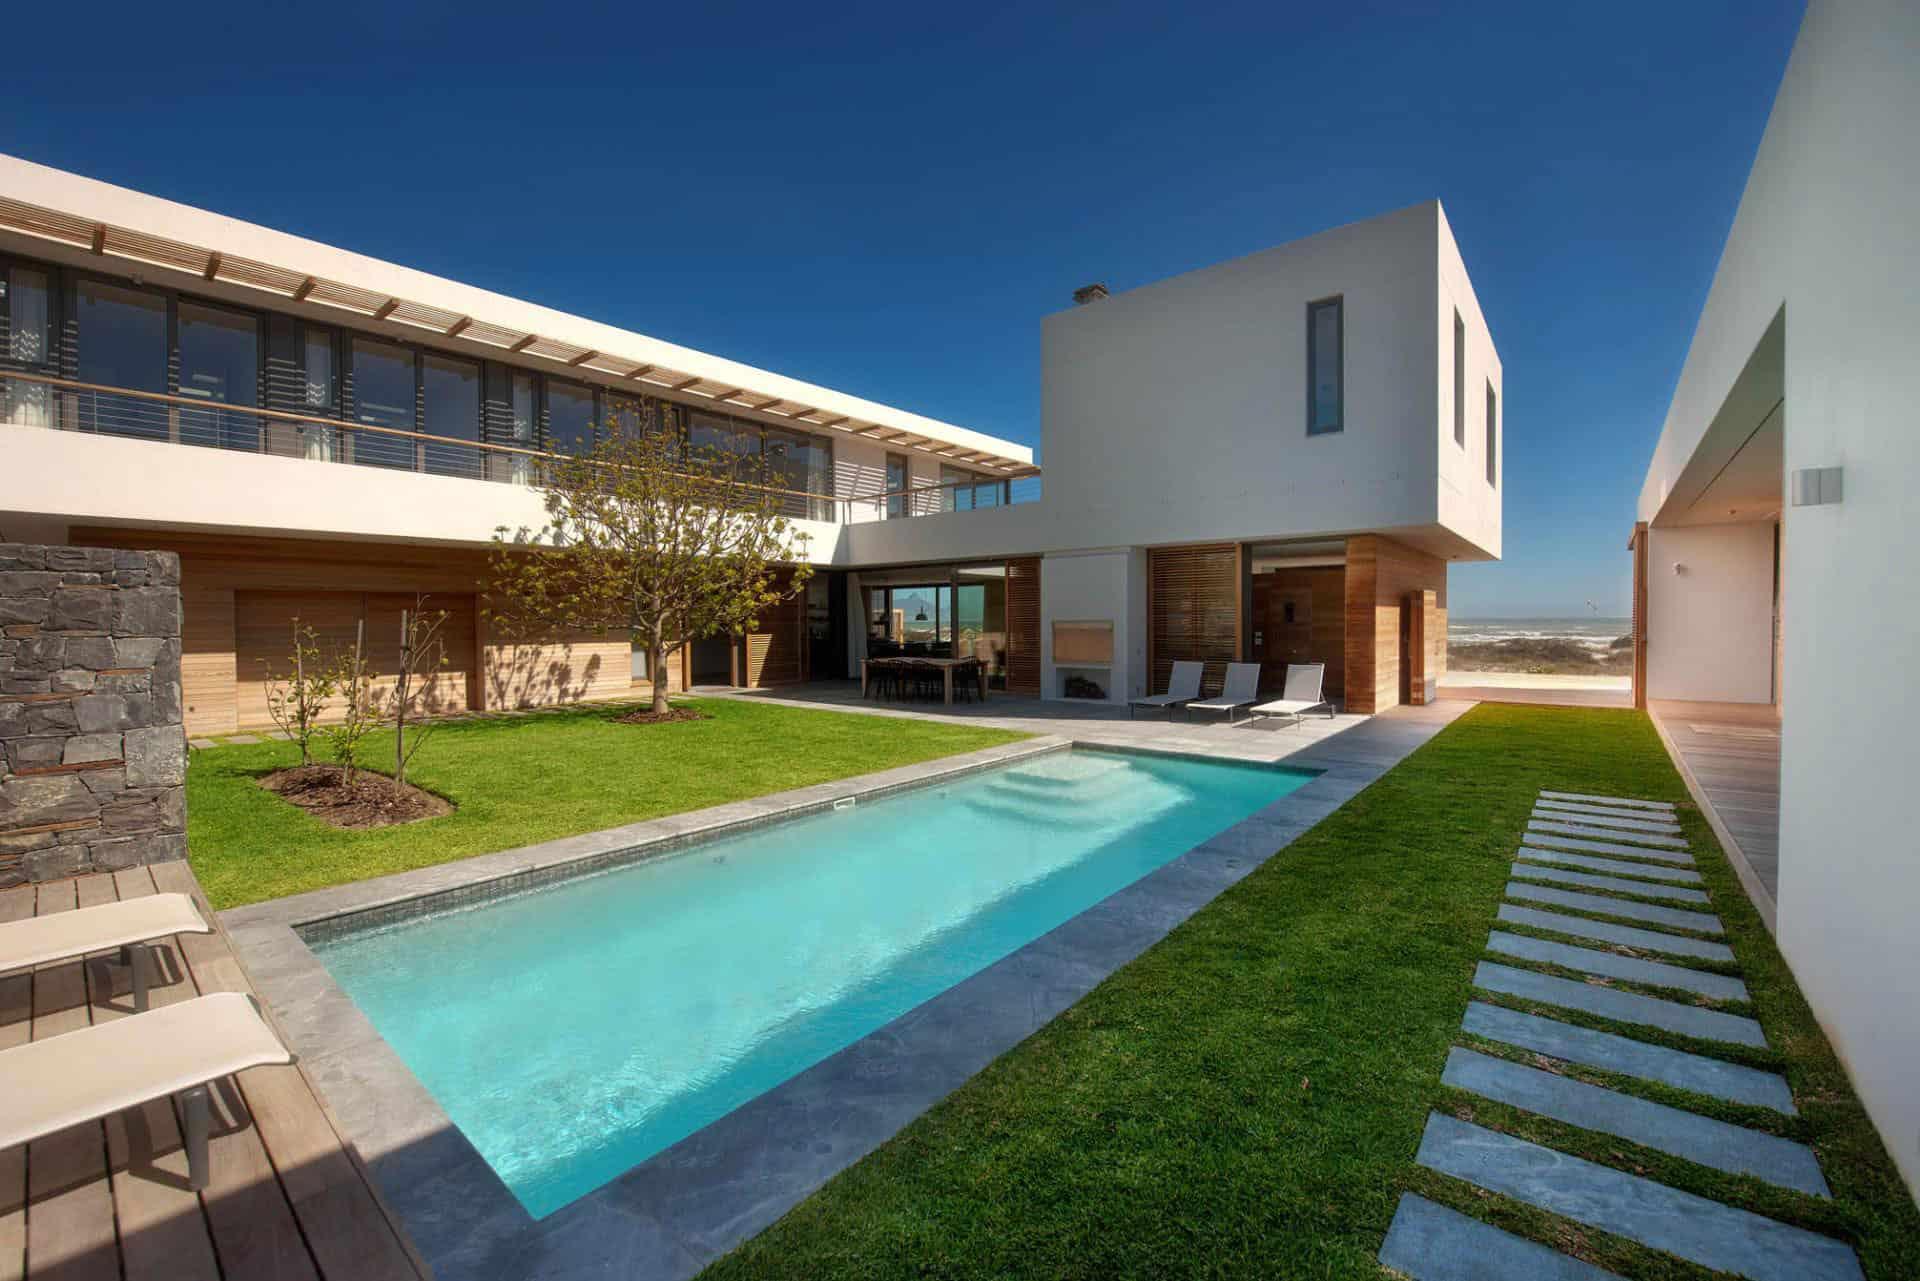 waters edge beach house by coa